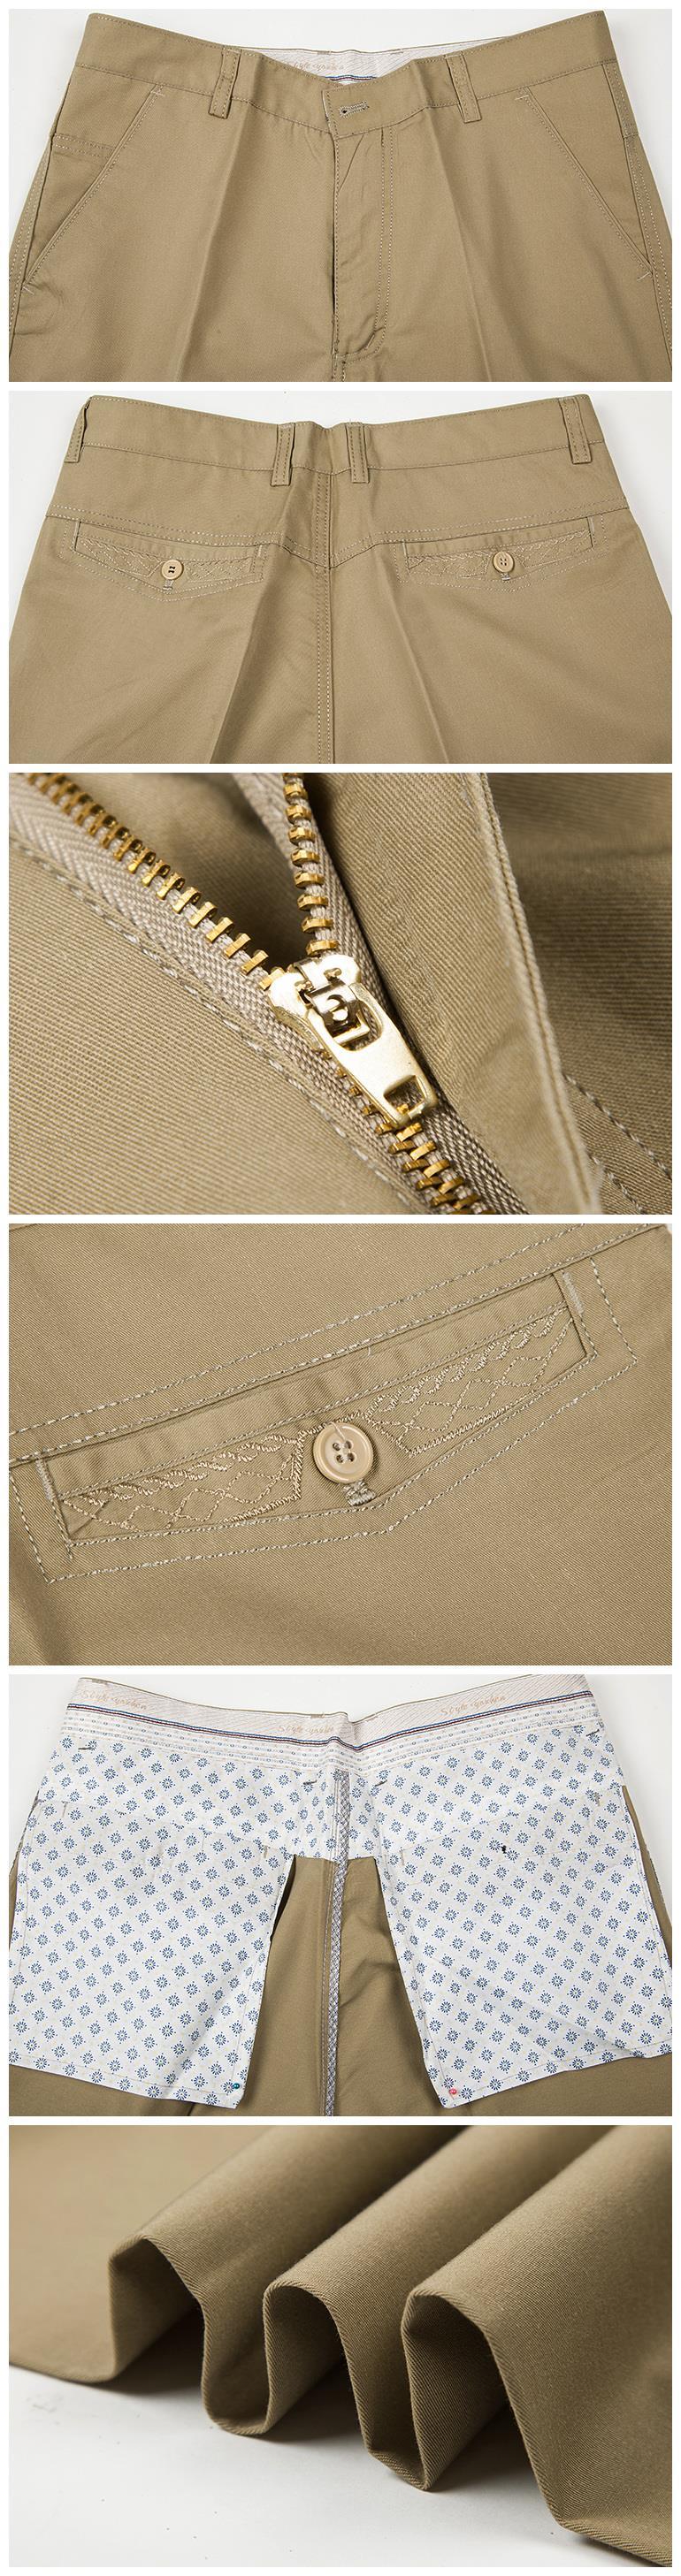 HTB18NKldeALL1JjSZFjq6ysqXXae Pants Men Size29-42 Spring Autumn Straight Pant 100% Cotton 55-120 kg Men Wear Comfortable warm Trousers Male Clothing